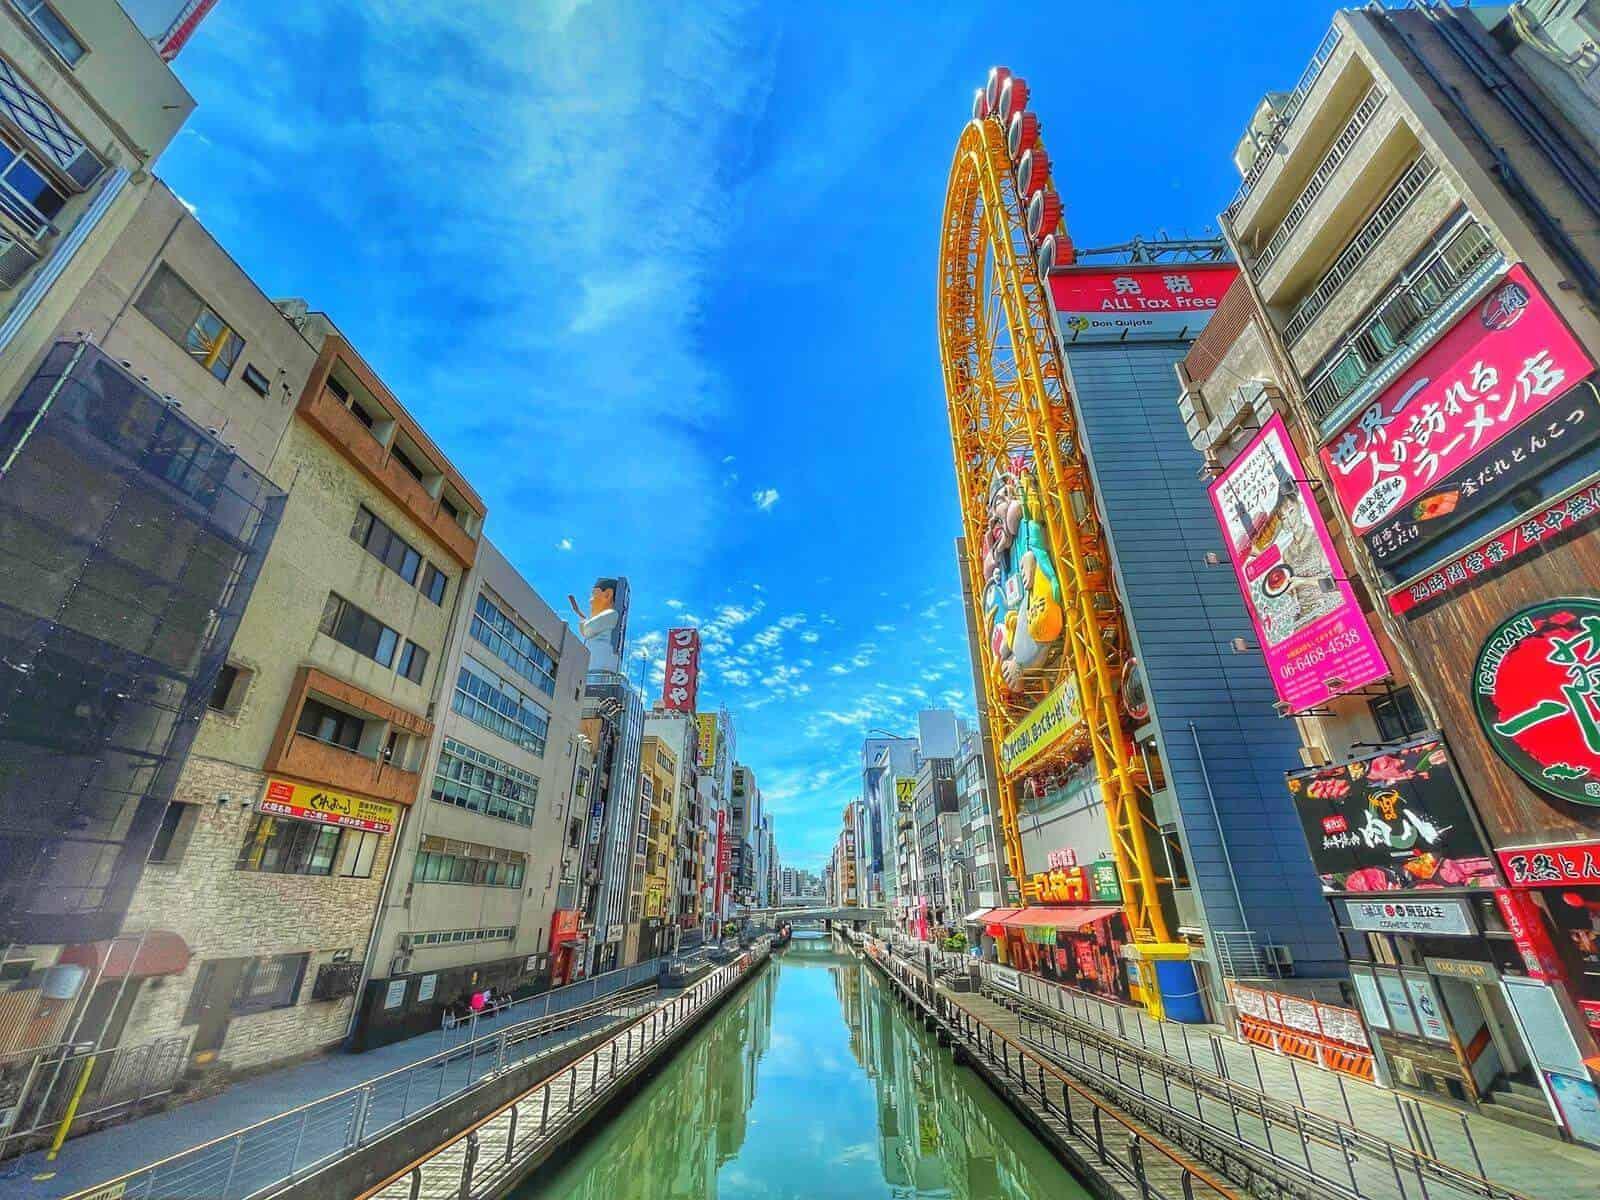 InsideJapan Tours